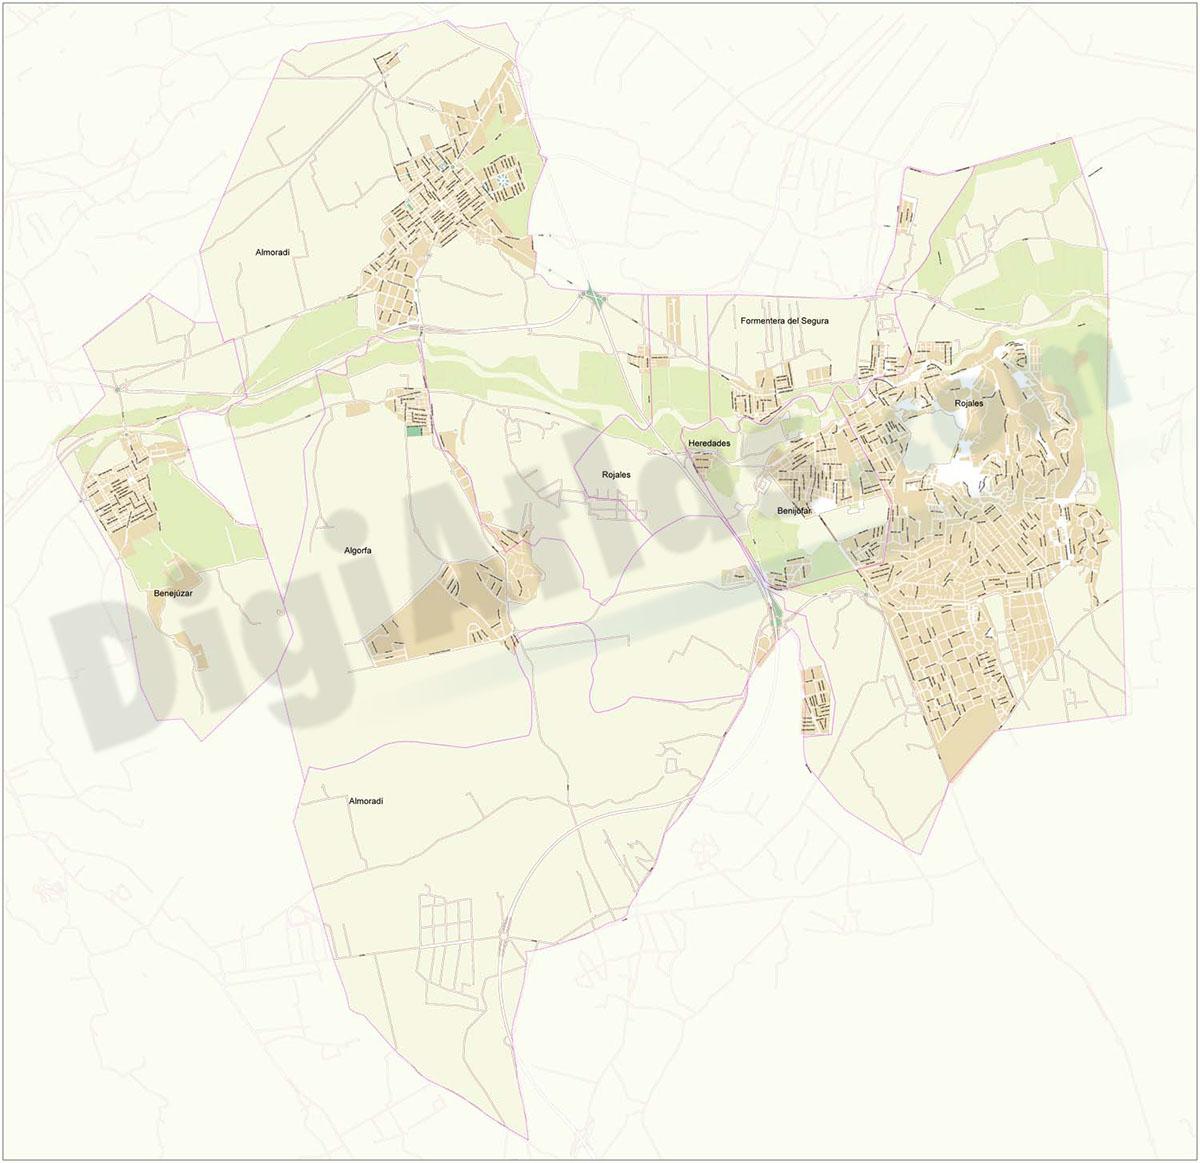 Almoradi and surrounding area - city map